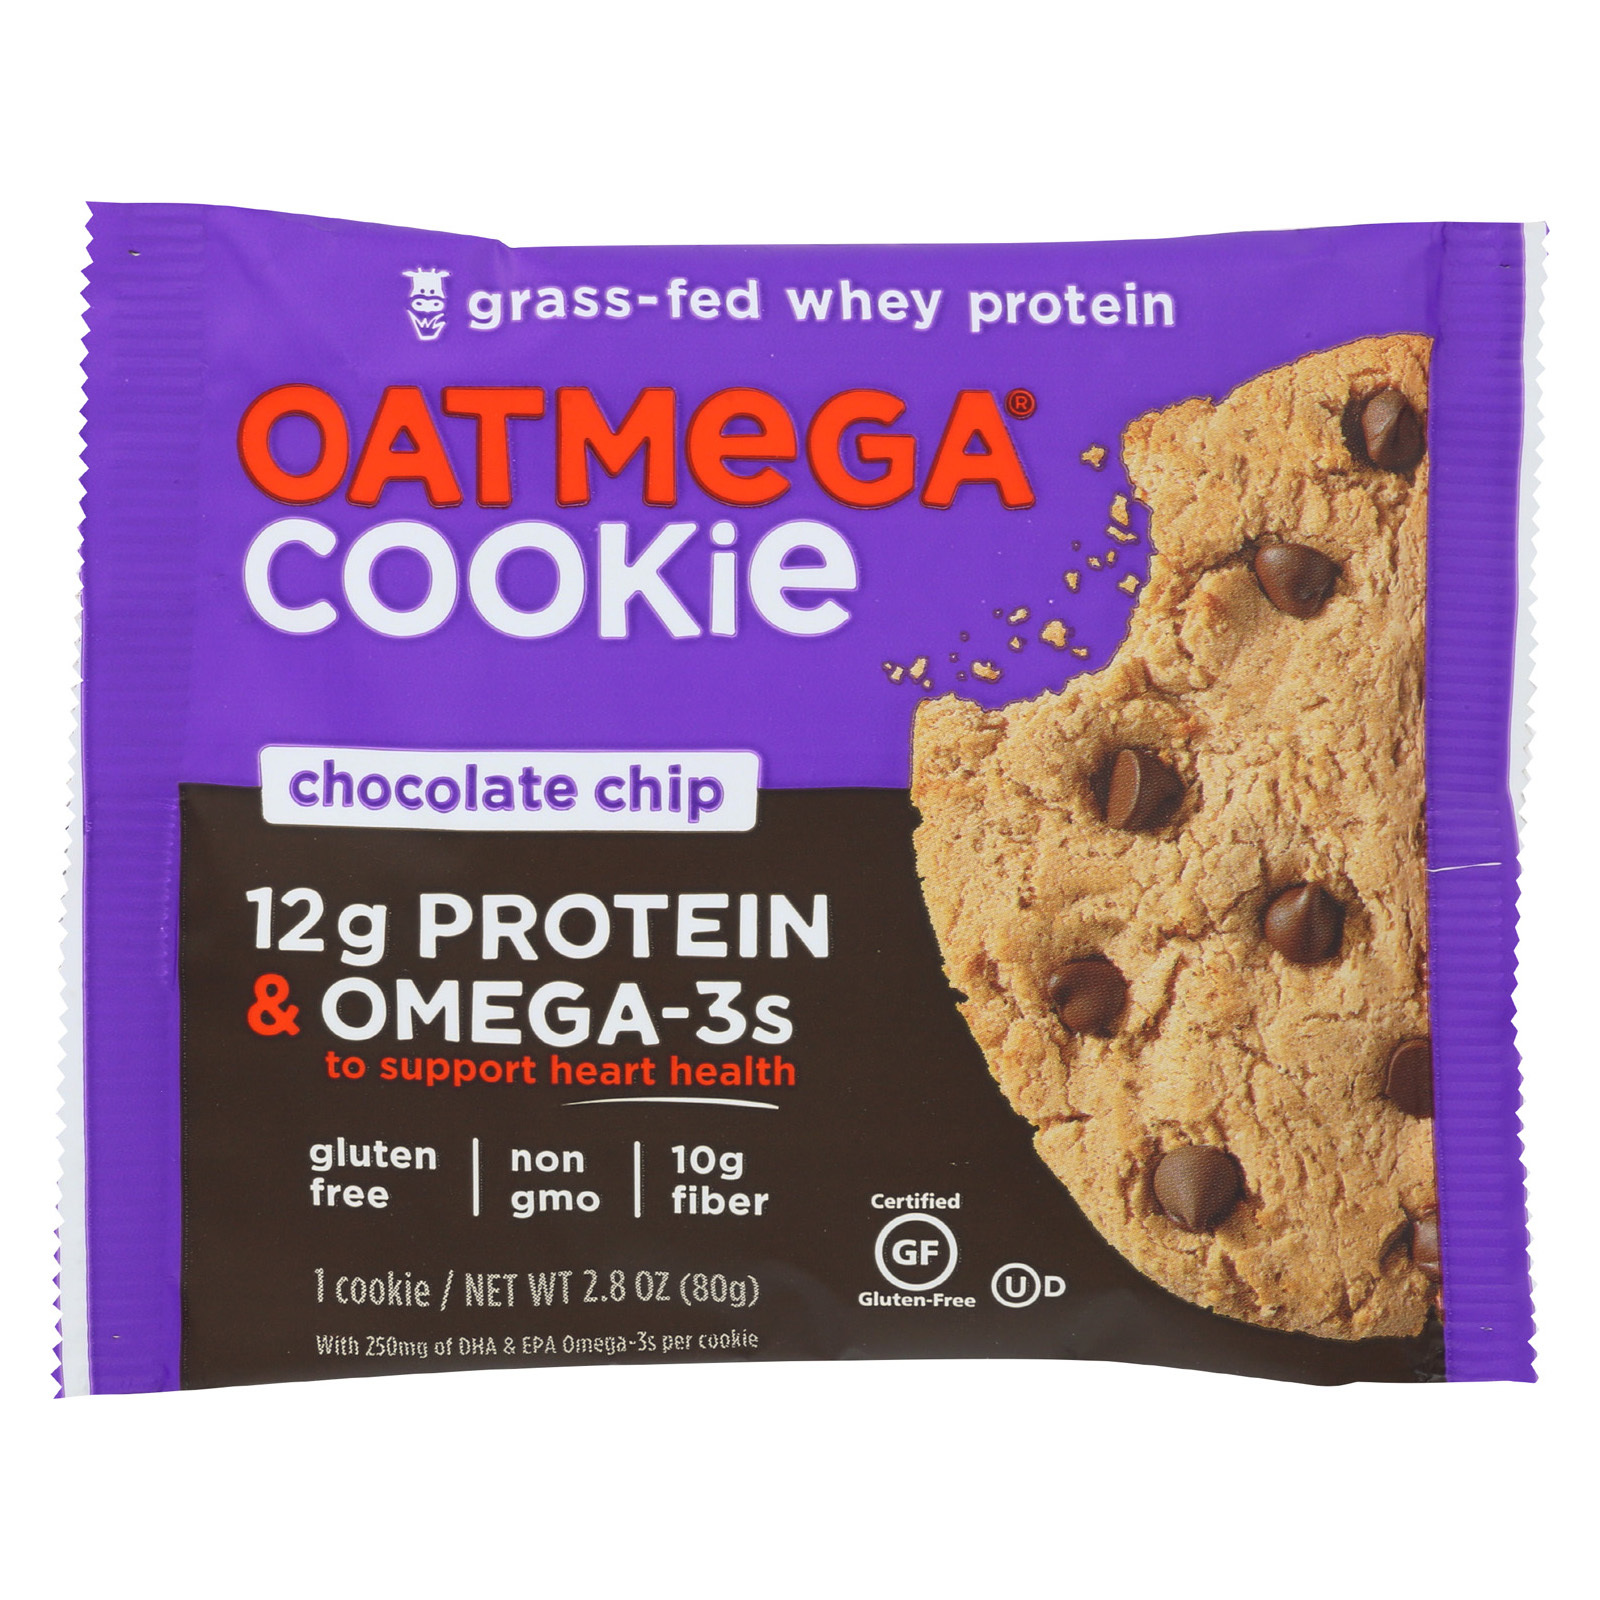 Oatmegabar Cookie - Chocolate Chip - Case of 12 - 2.8 oz